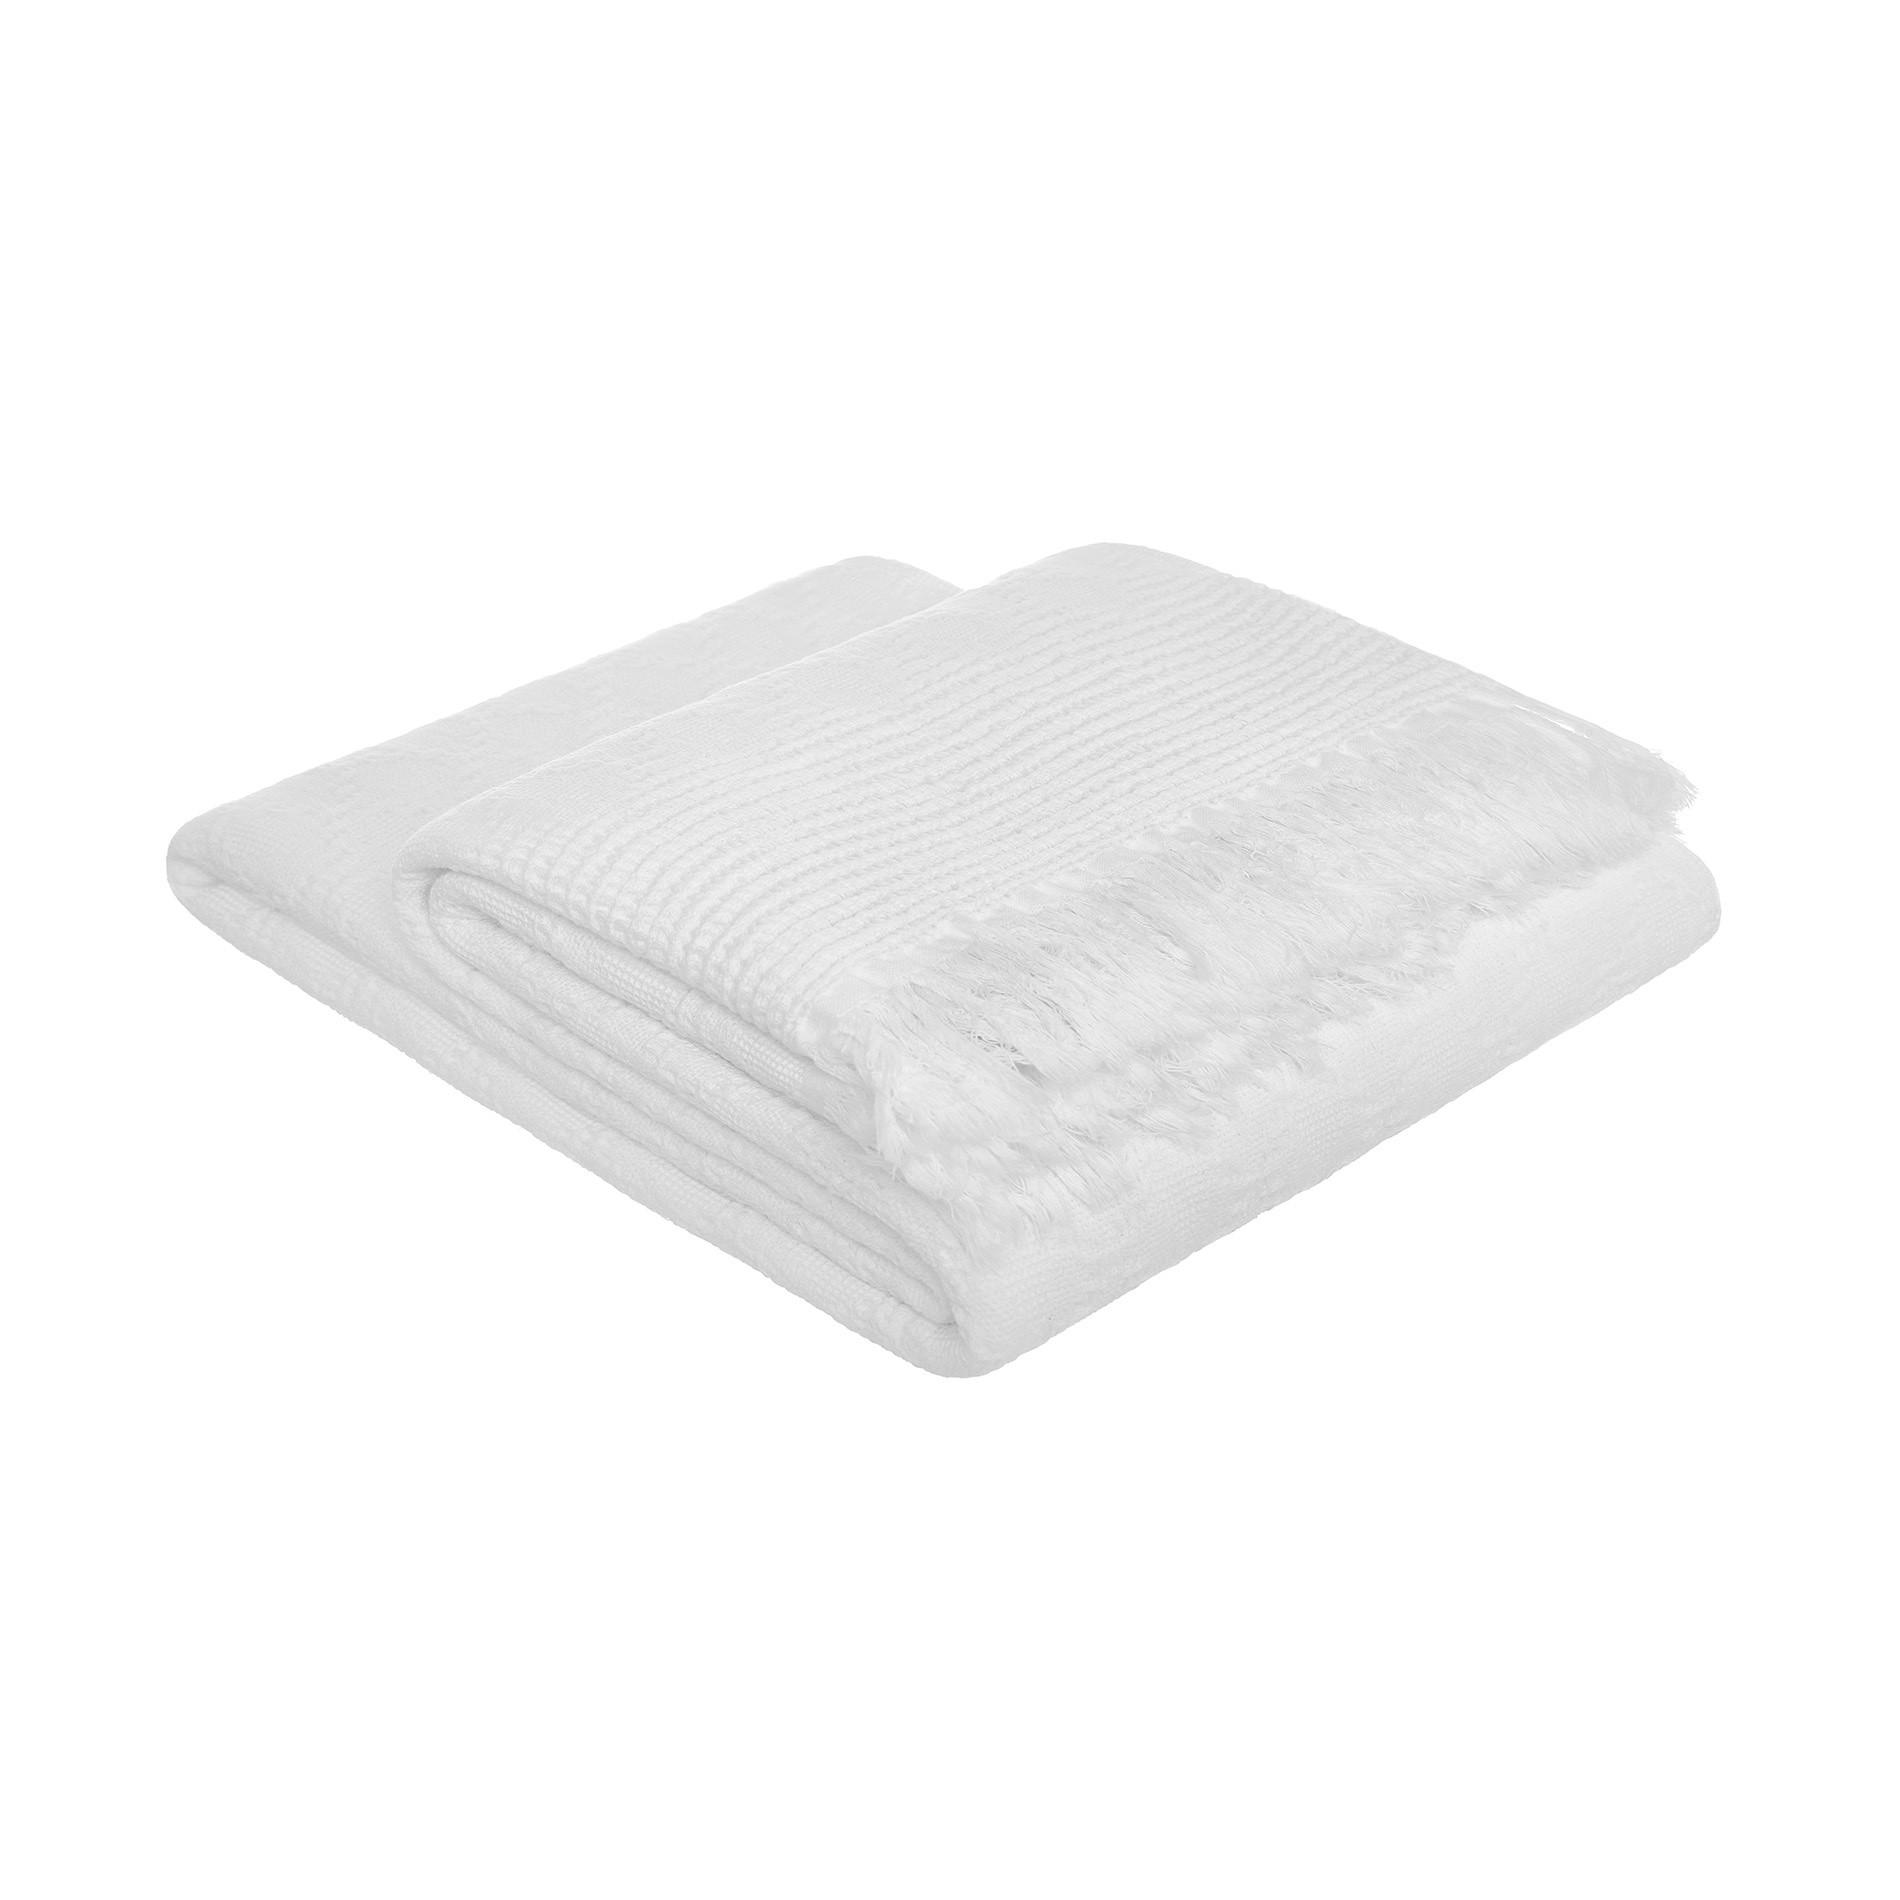 Plaid misto lino e cotone a rombi, Bianco, large image number 1